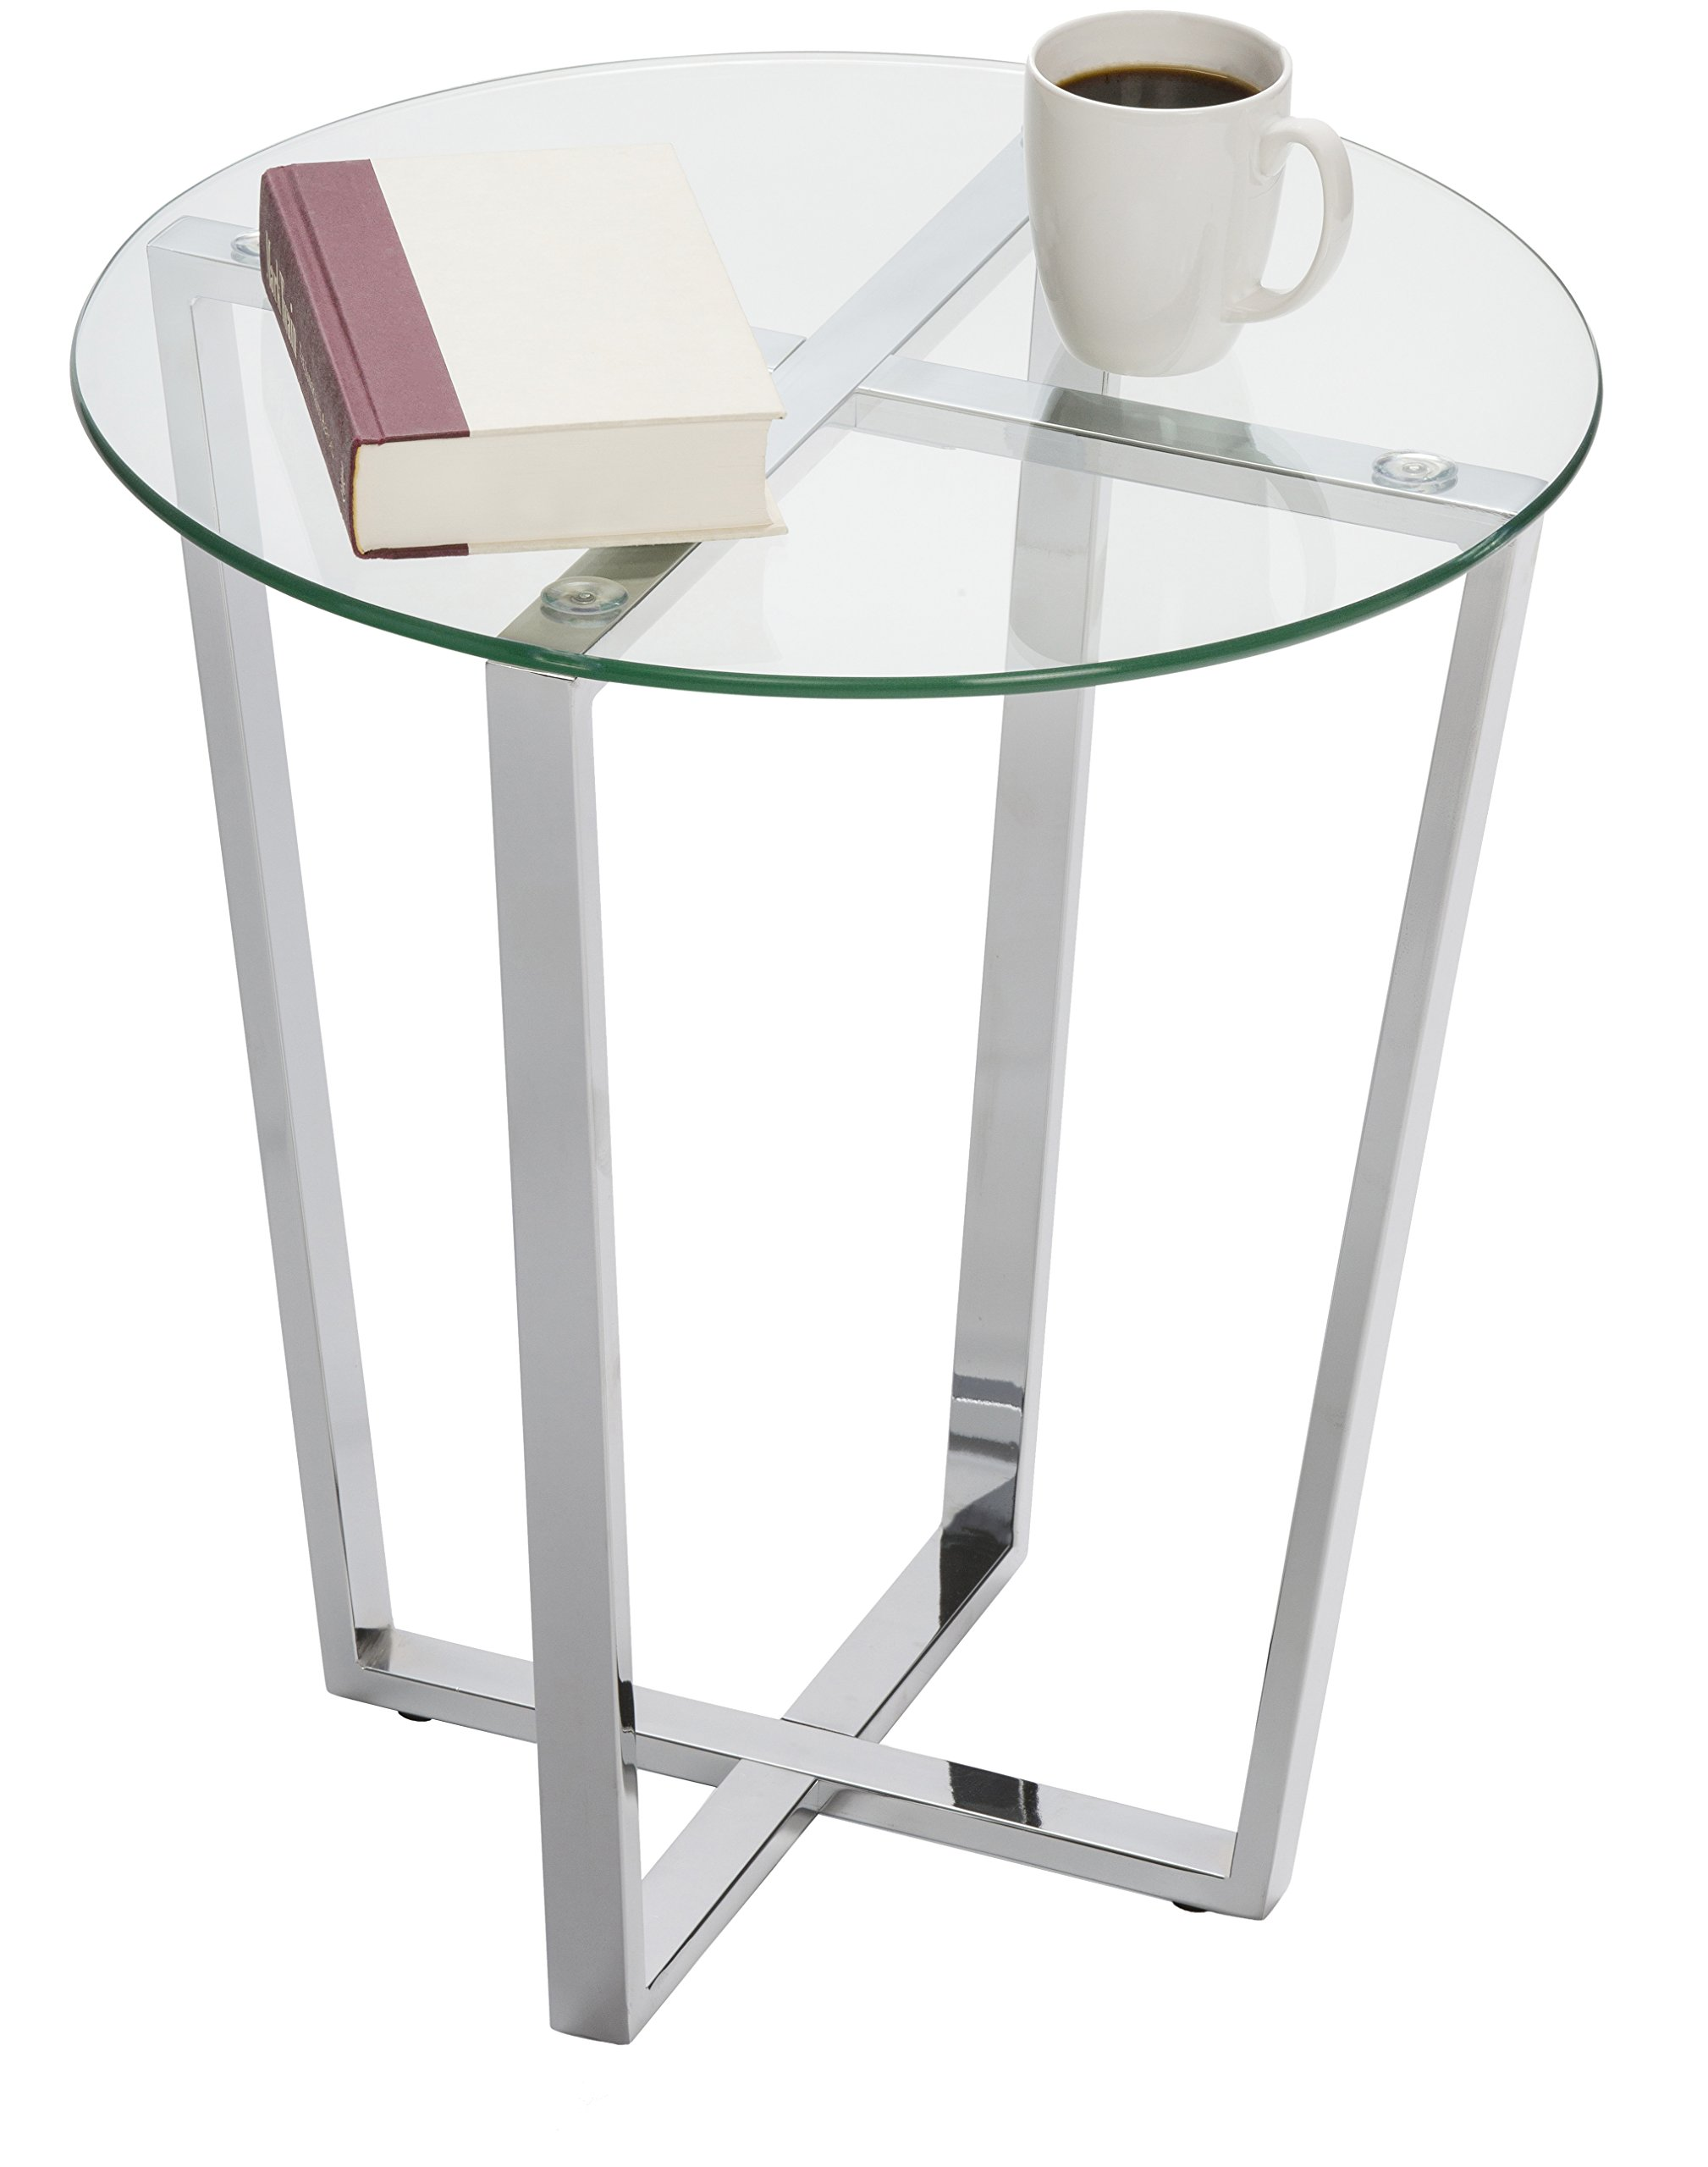 Mango Steam Metro Glass End Table - Clear Top/Chrome Base